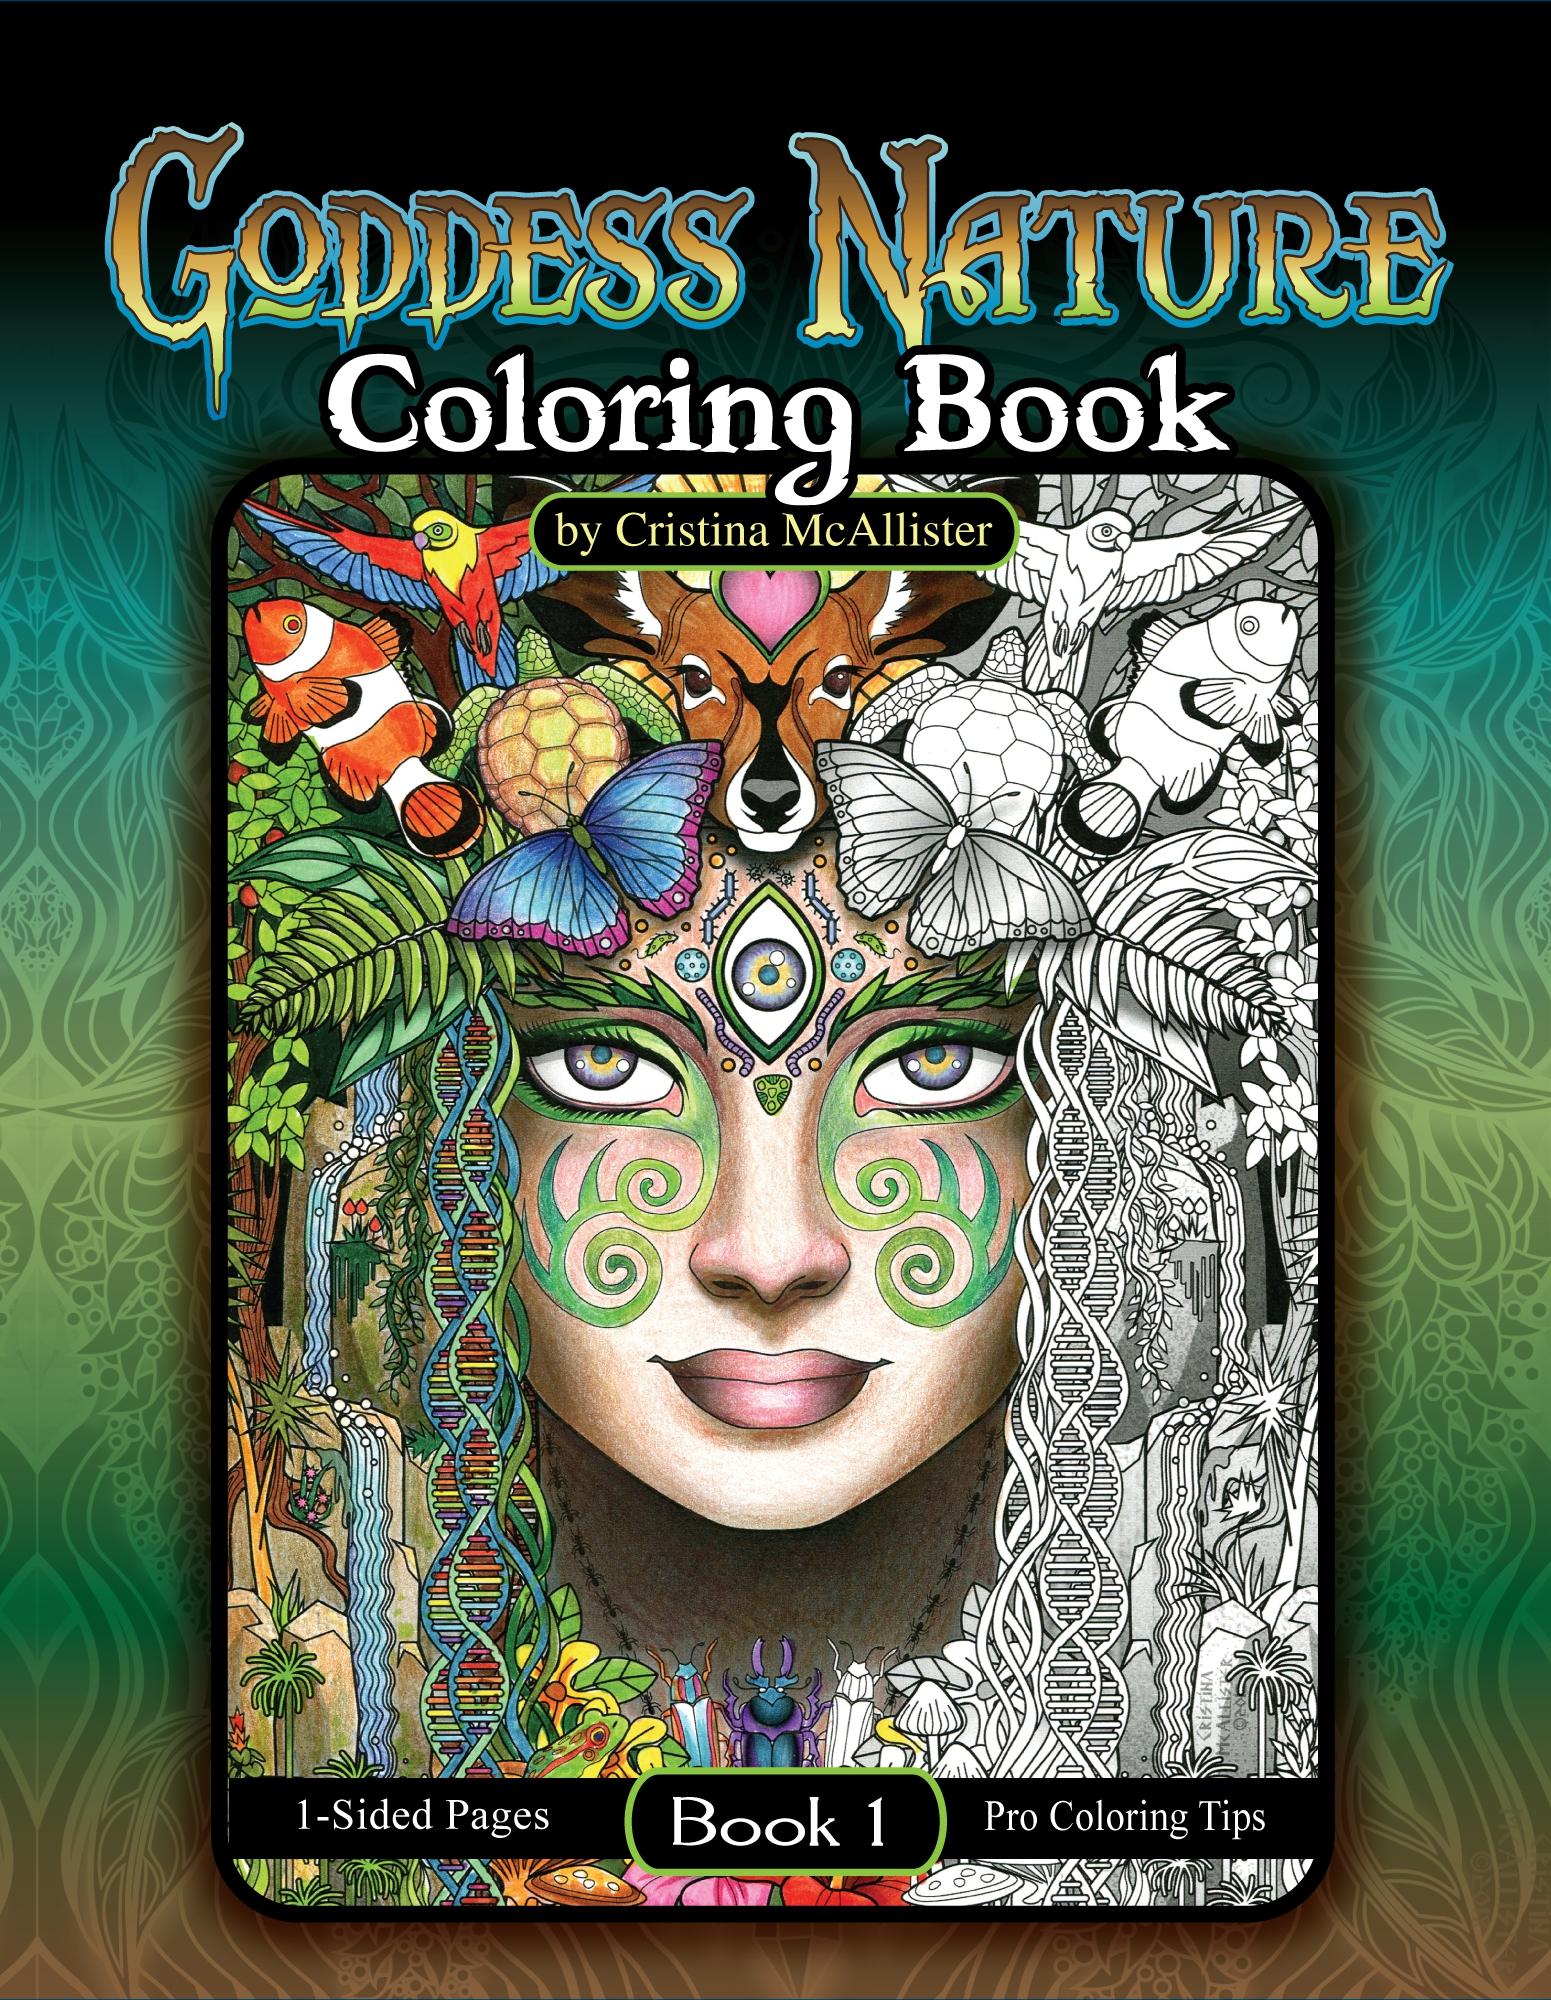 Goddess Nature Coloring Book Book 1 Download Cristina Mcallister